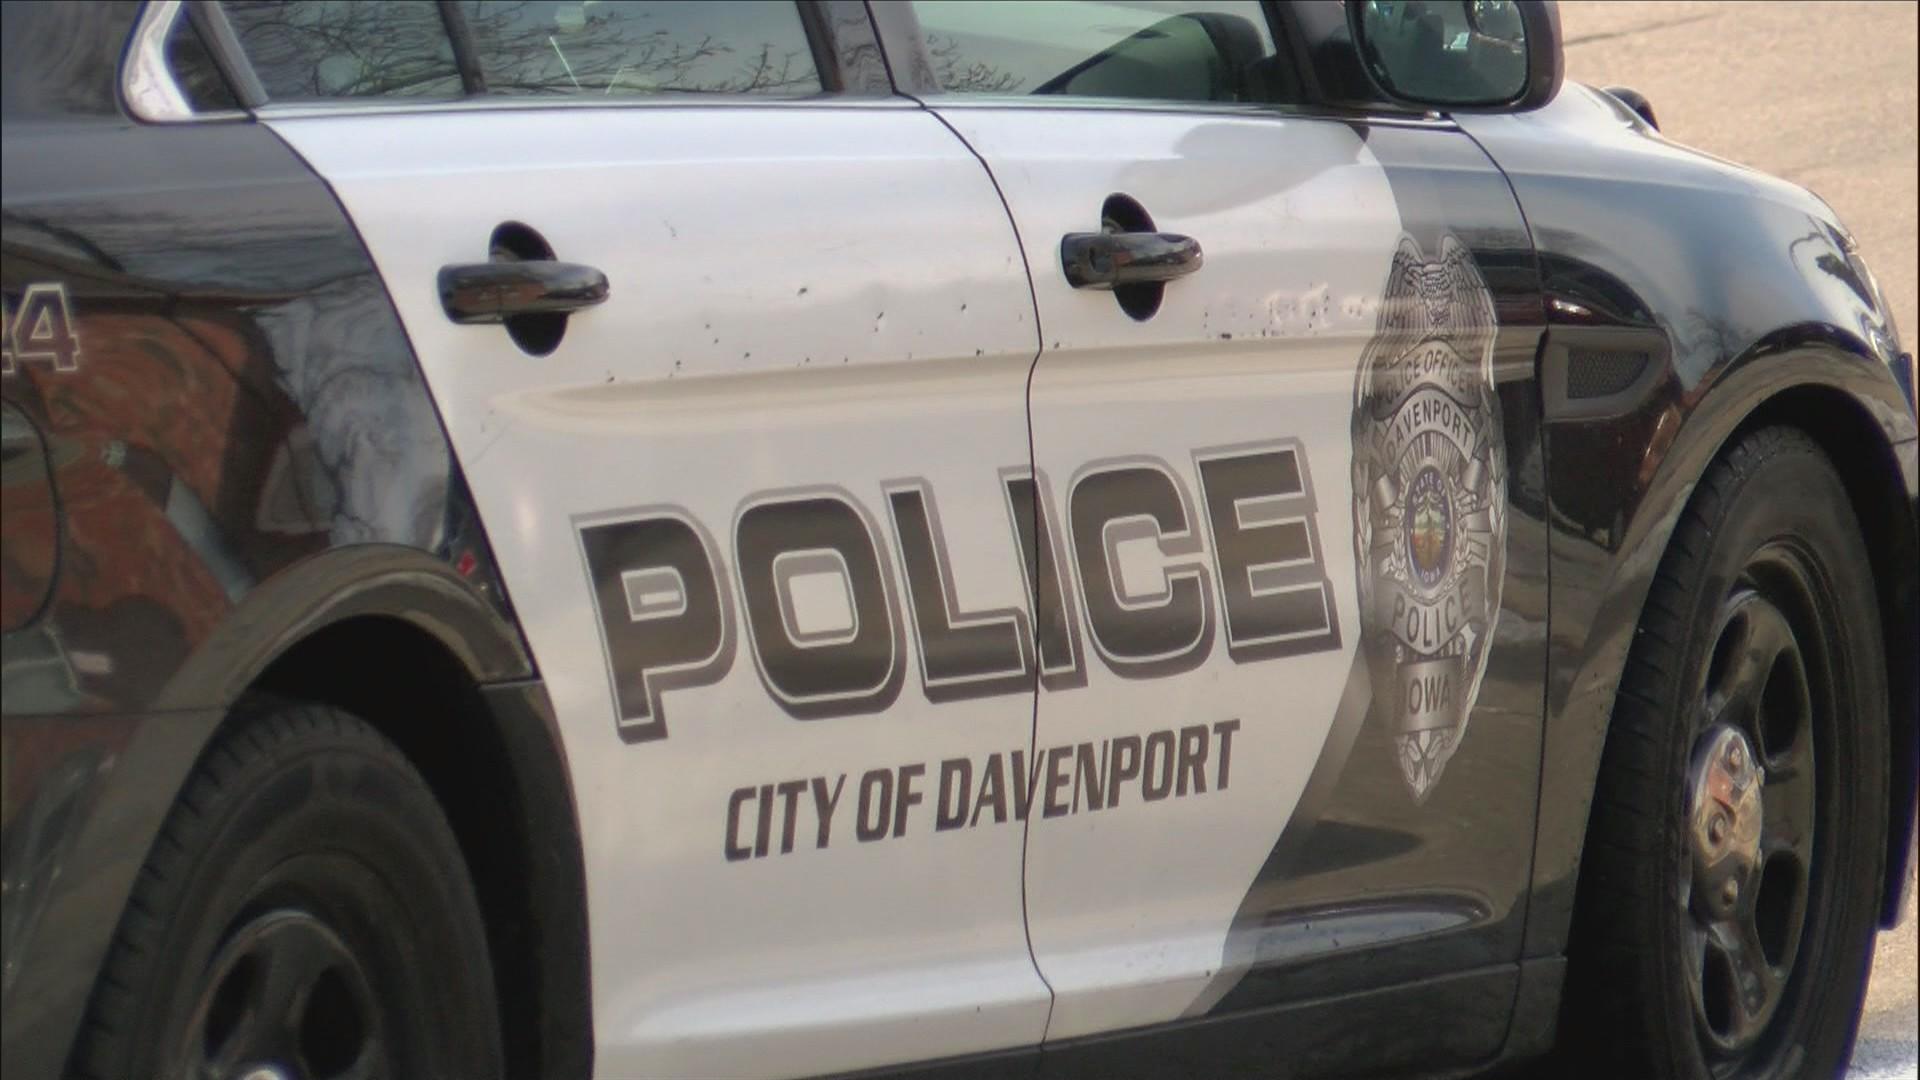 davenport police car DFCDAF203C51474098495D360EB70FD3_1552930252622.jpg